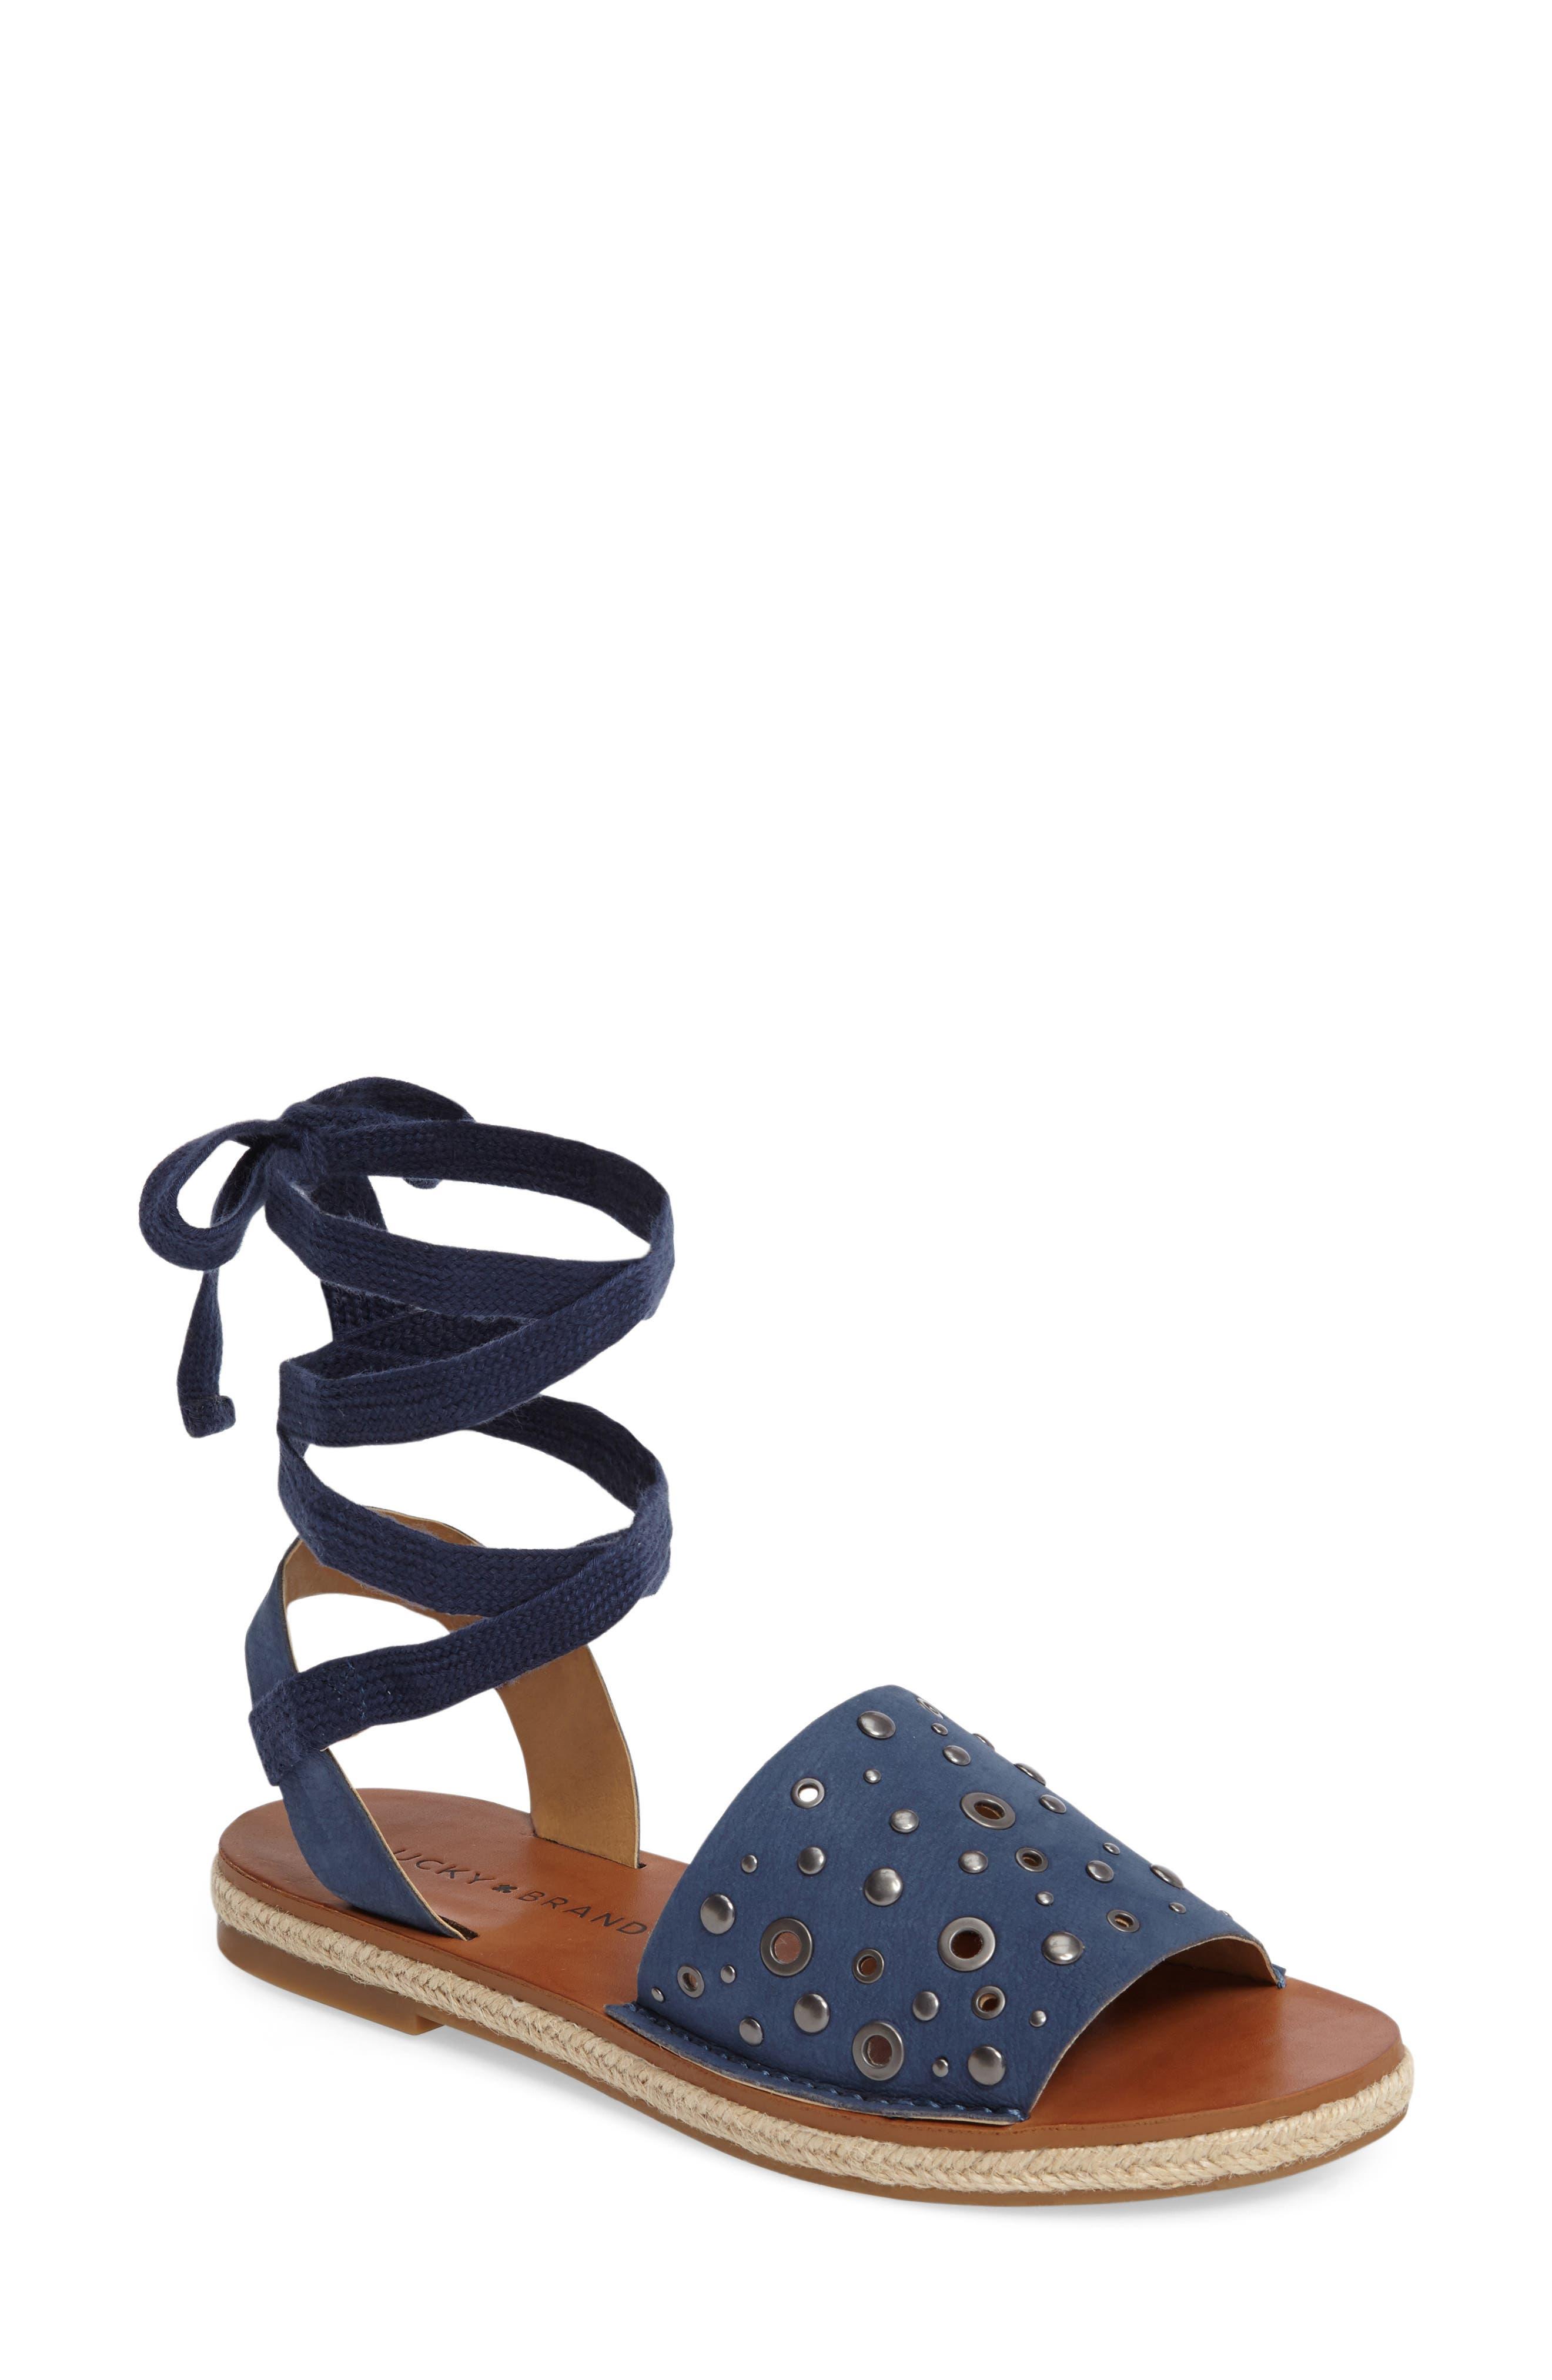 Daytah Ankle Tie Sandal,                             Main thumbnail 4, color,